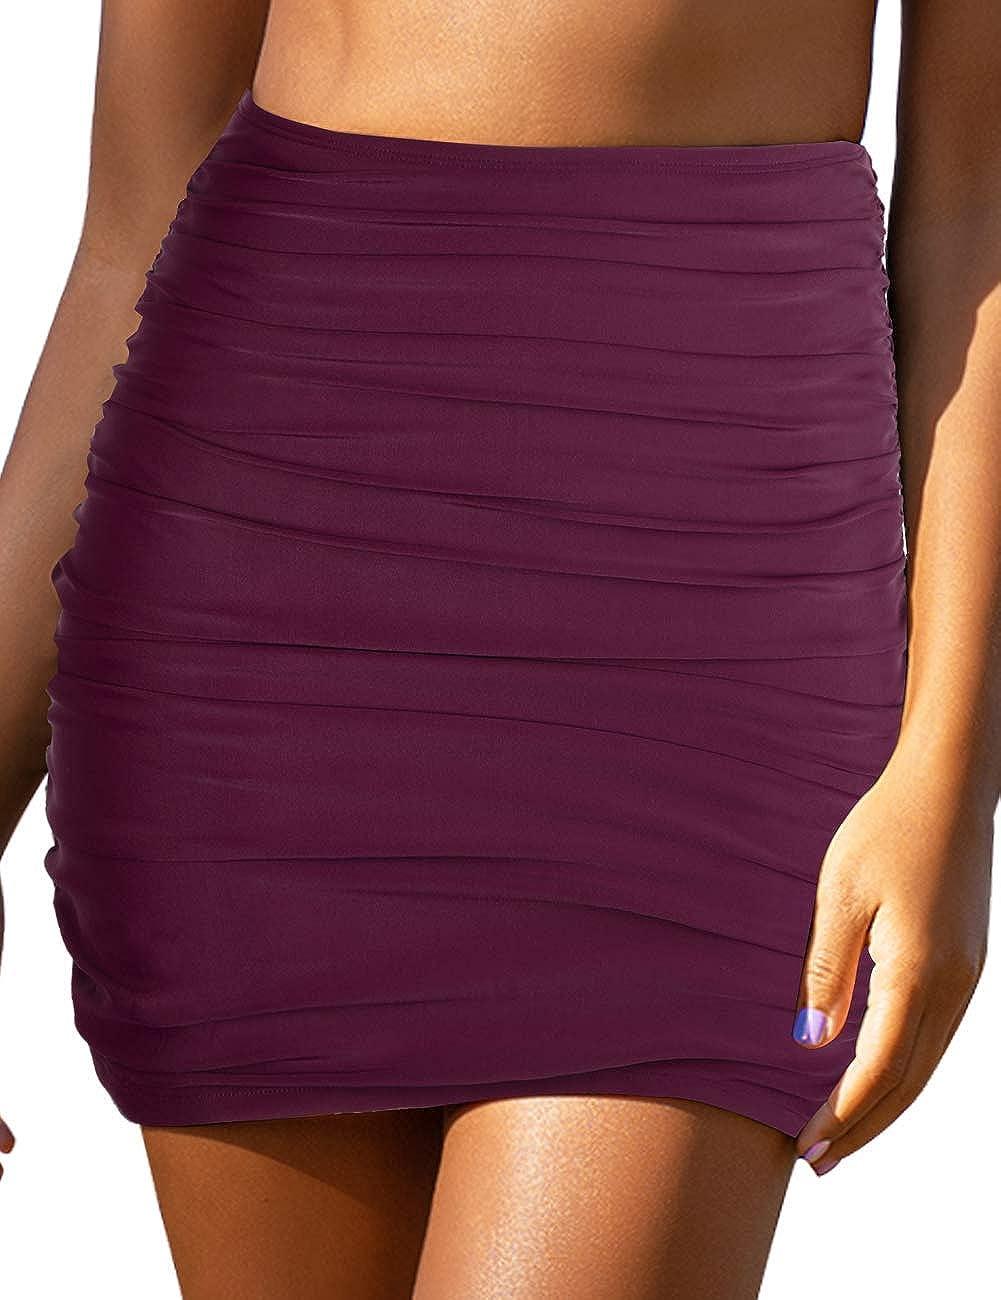 Hilor Women's Shirred High Waisted Swim Skirt Skirted Bikini Bottom Tummy Control Swimwear Bottom